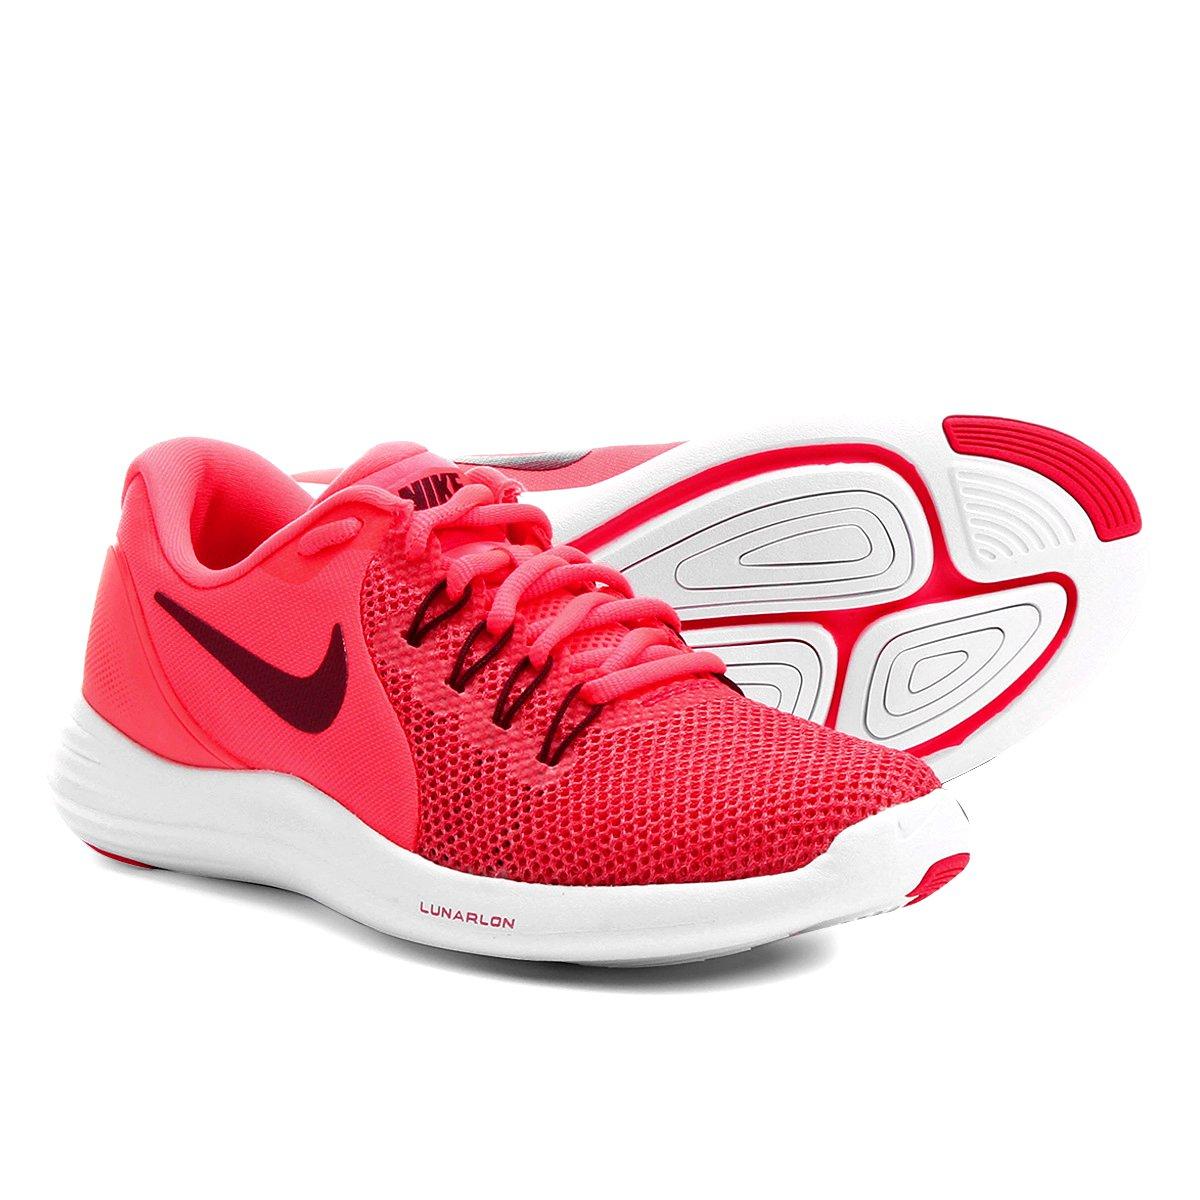 b0bdc98412aad Tênis Nike Lunar Apparent Feminino | Shop Timão